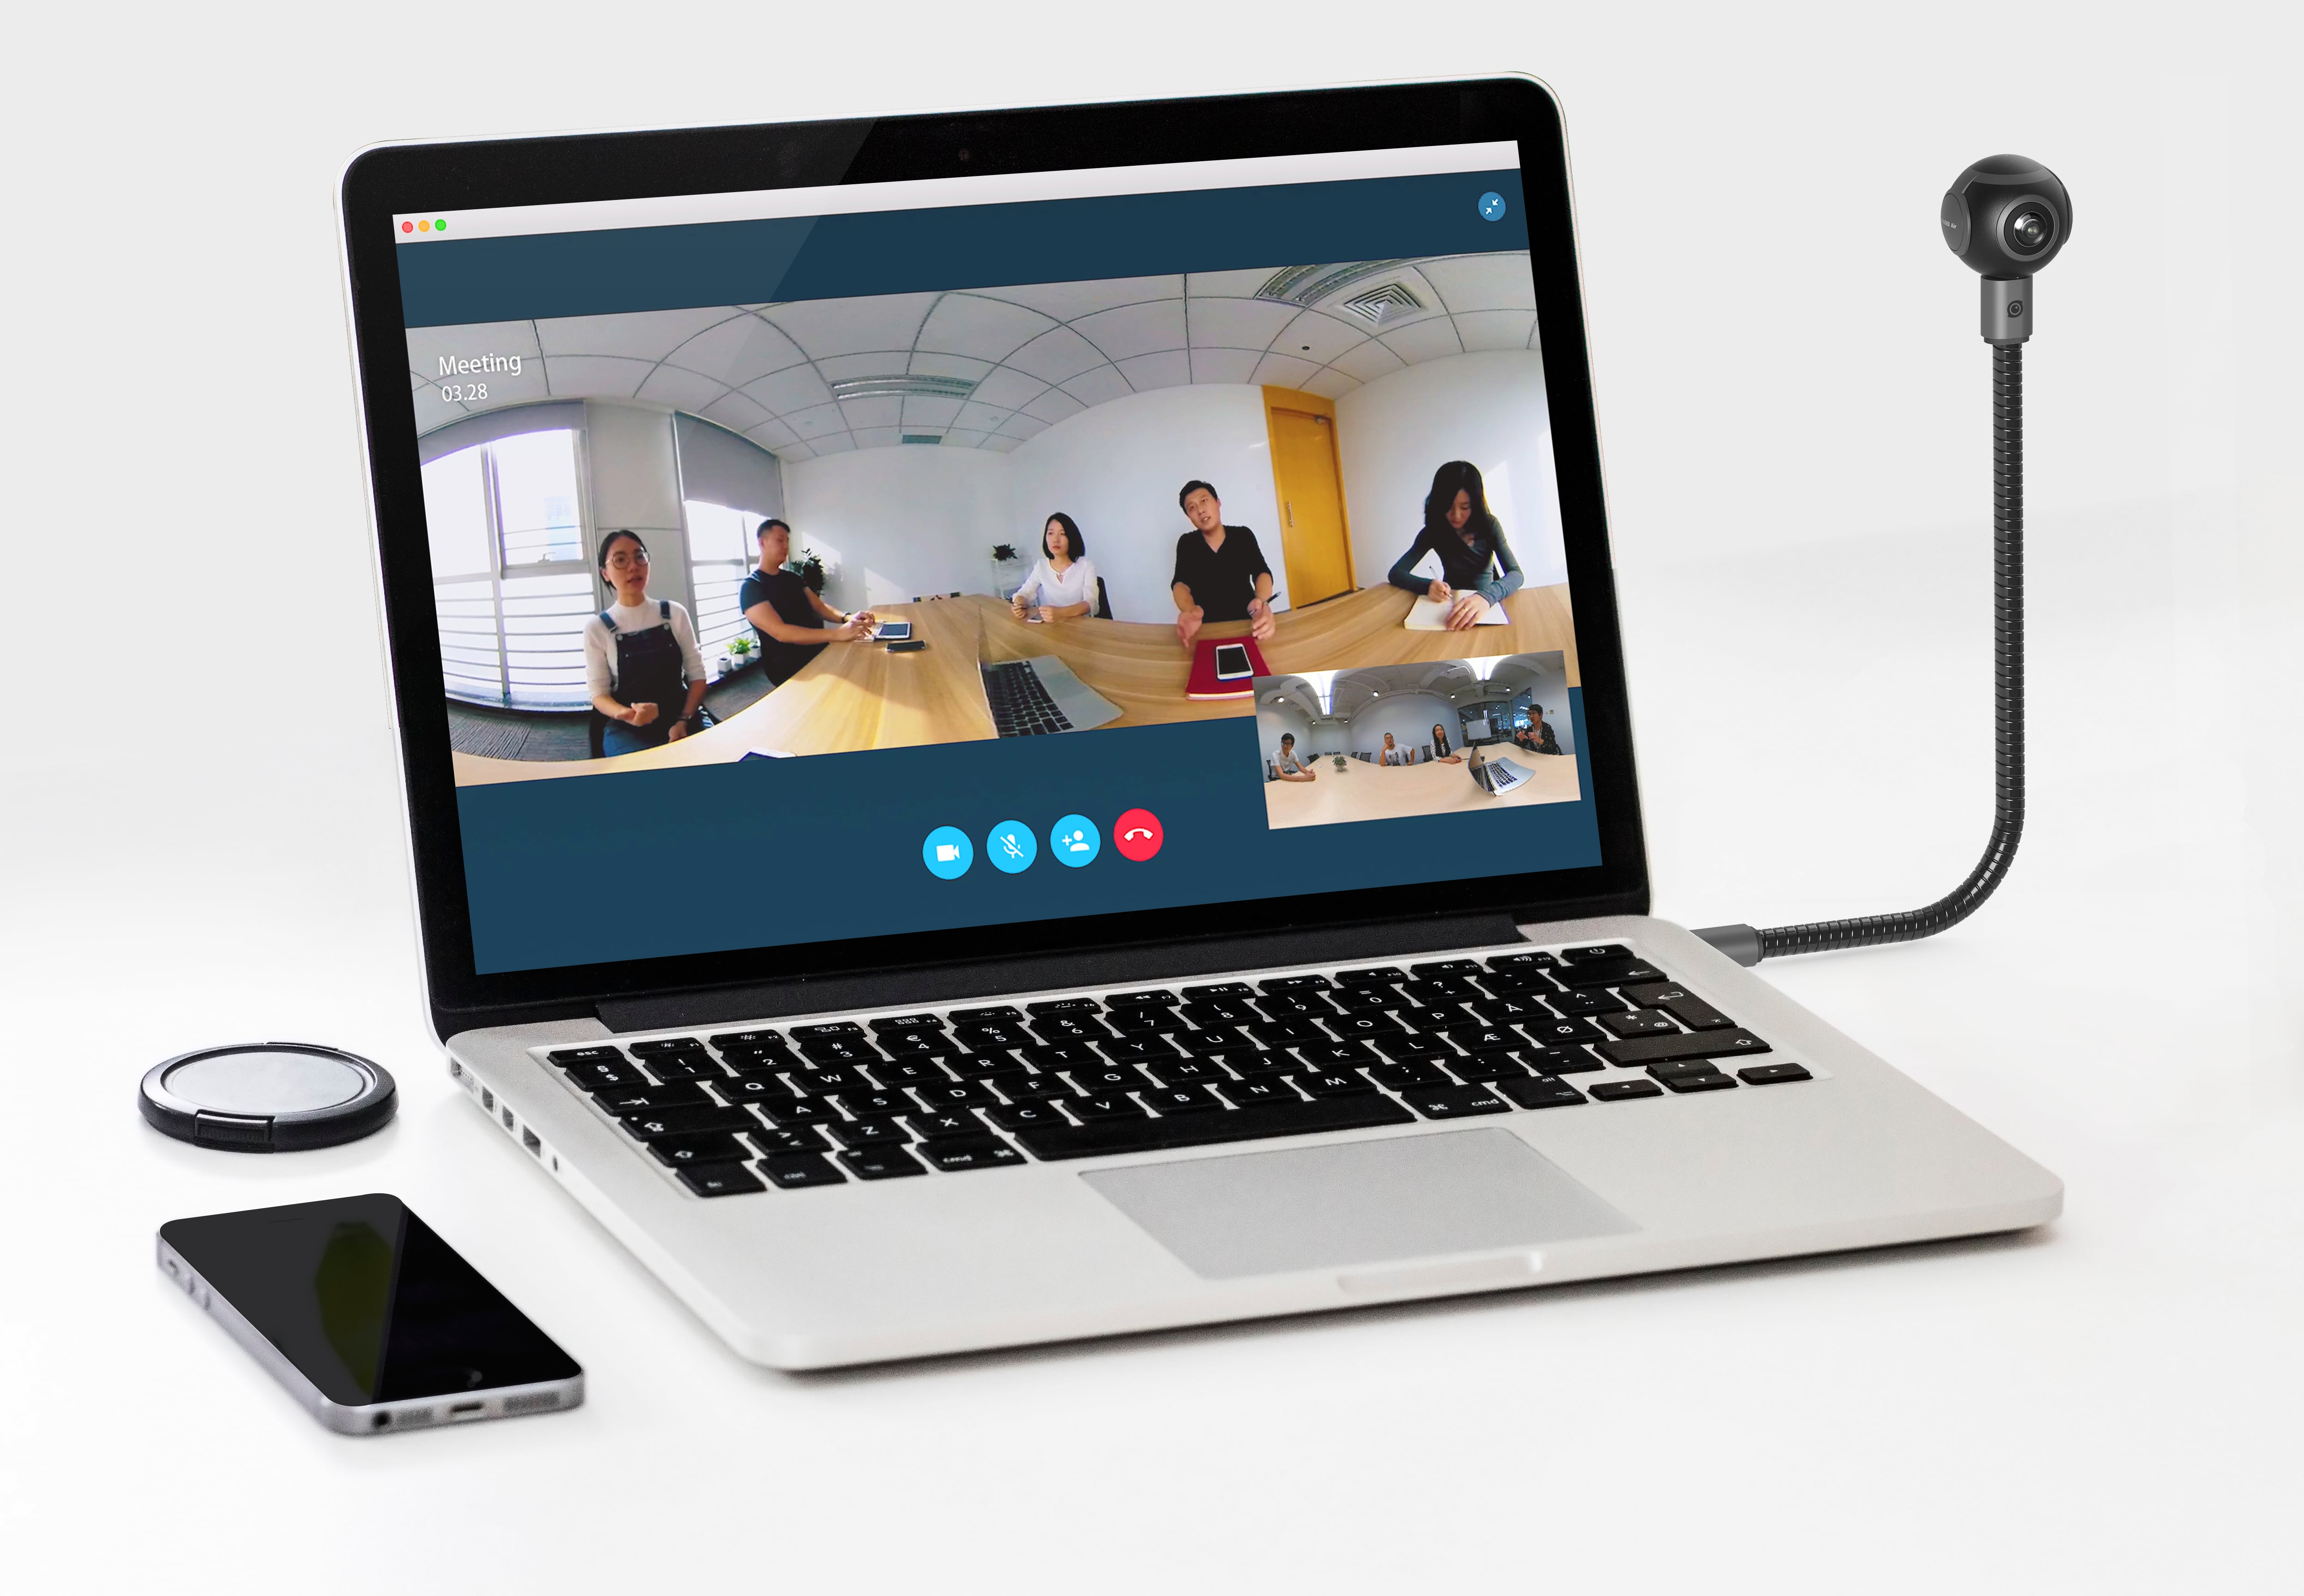 Insta360 VR Webcam